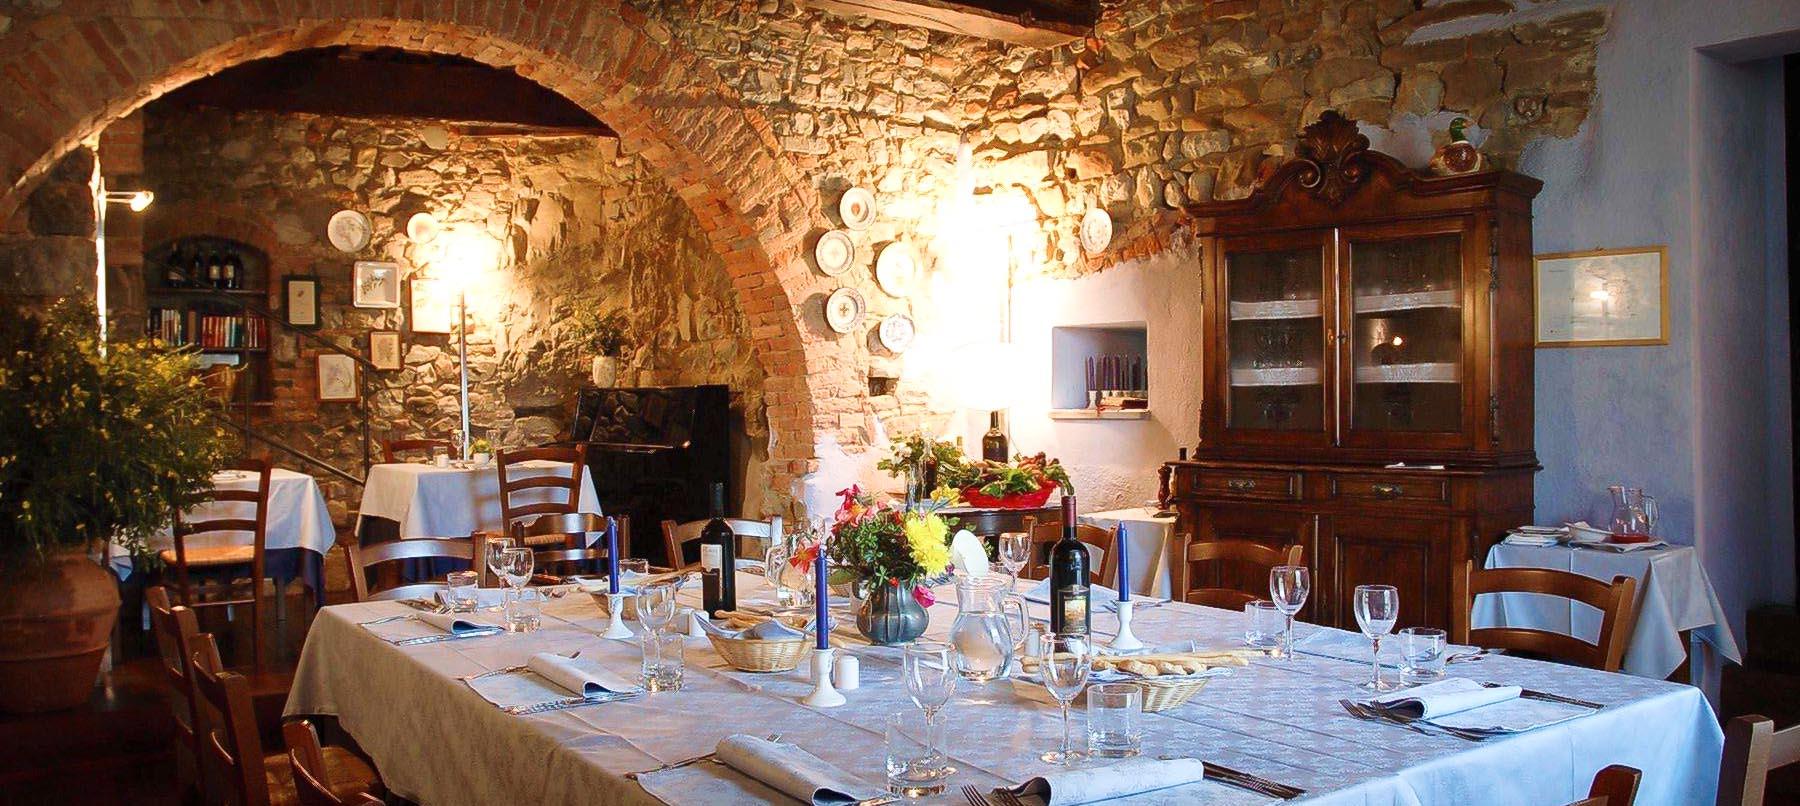 tuscany chianti restaurants